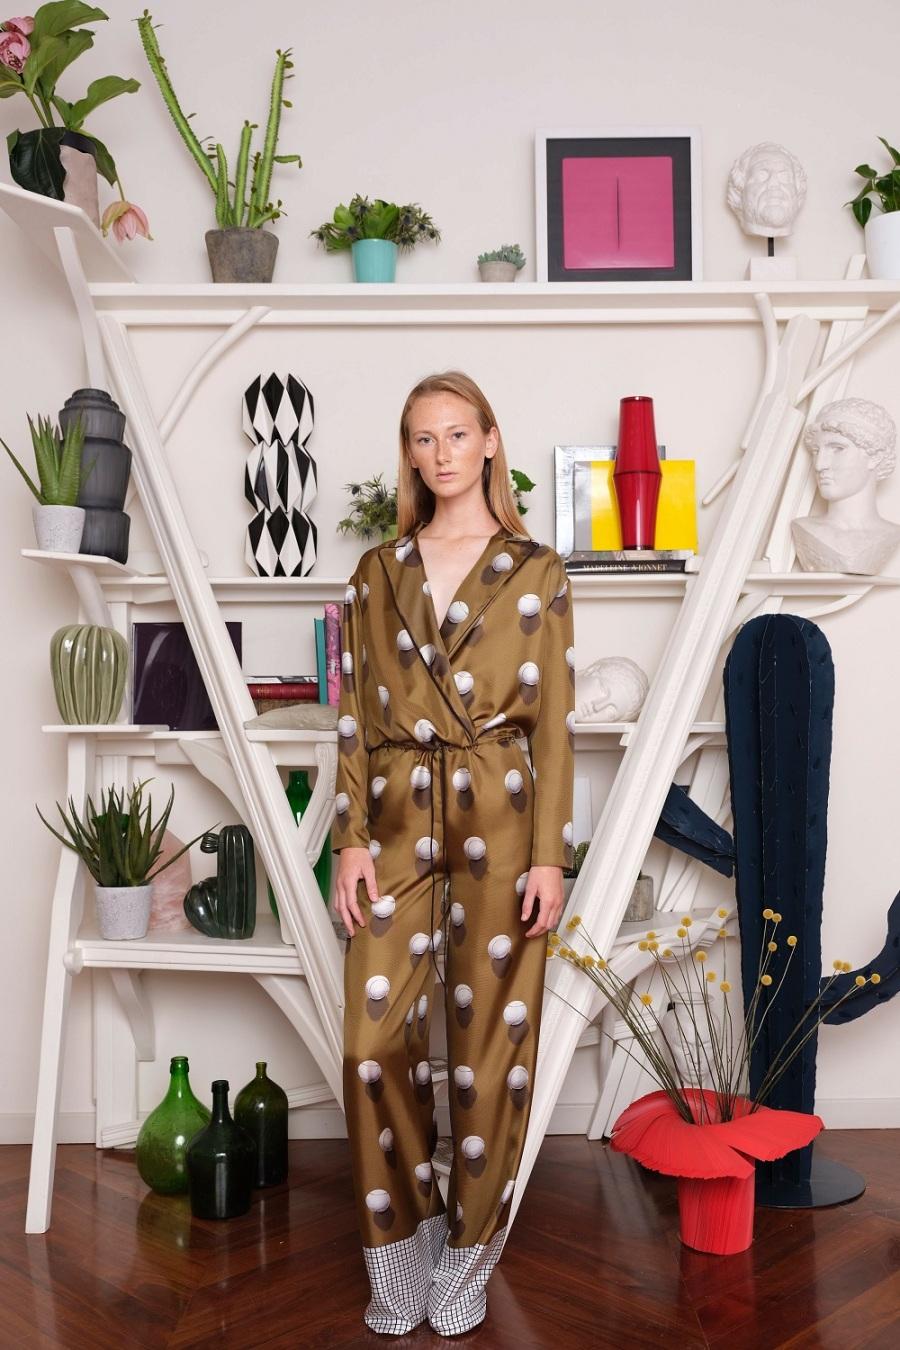 00024-vionnet-Vogue-resort-2019-pr